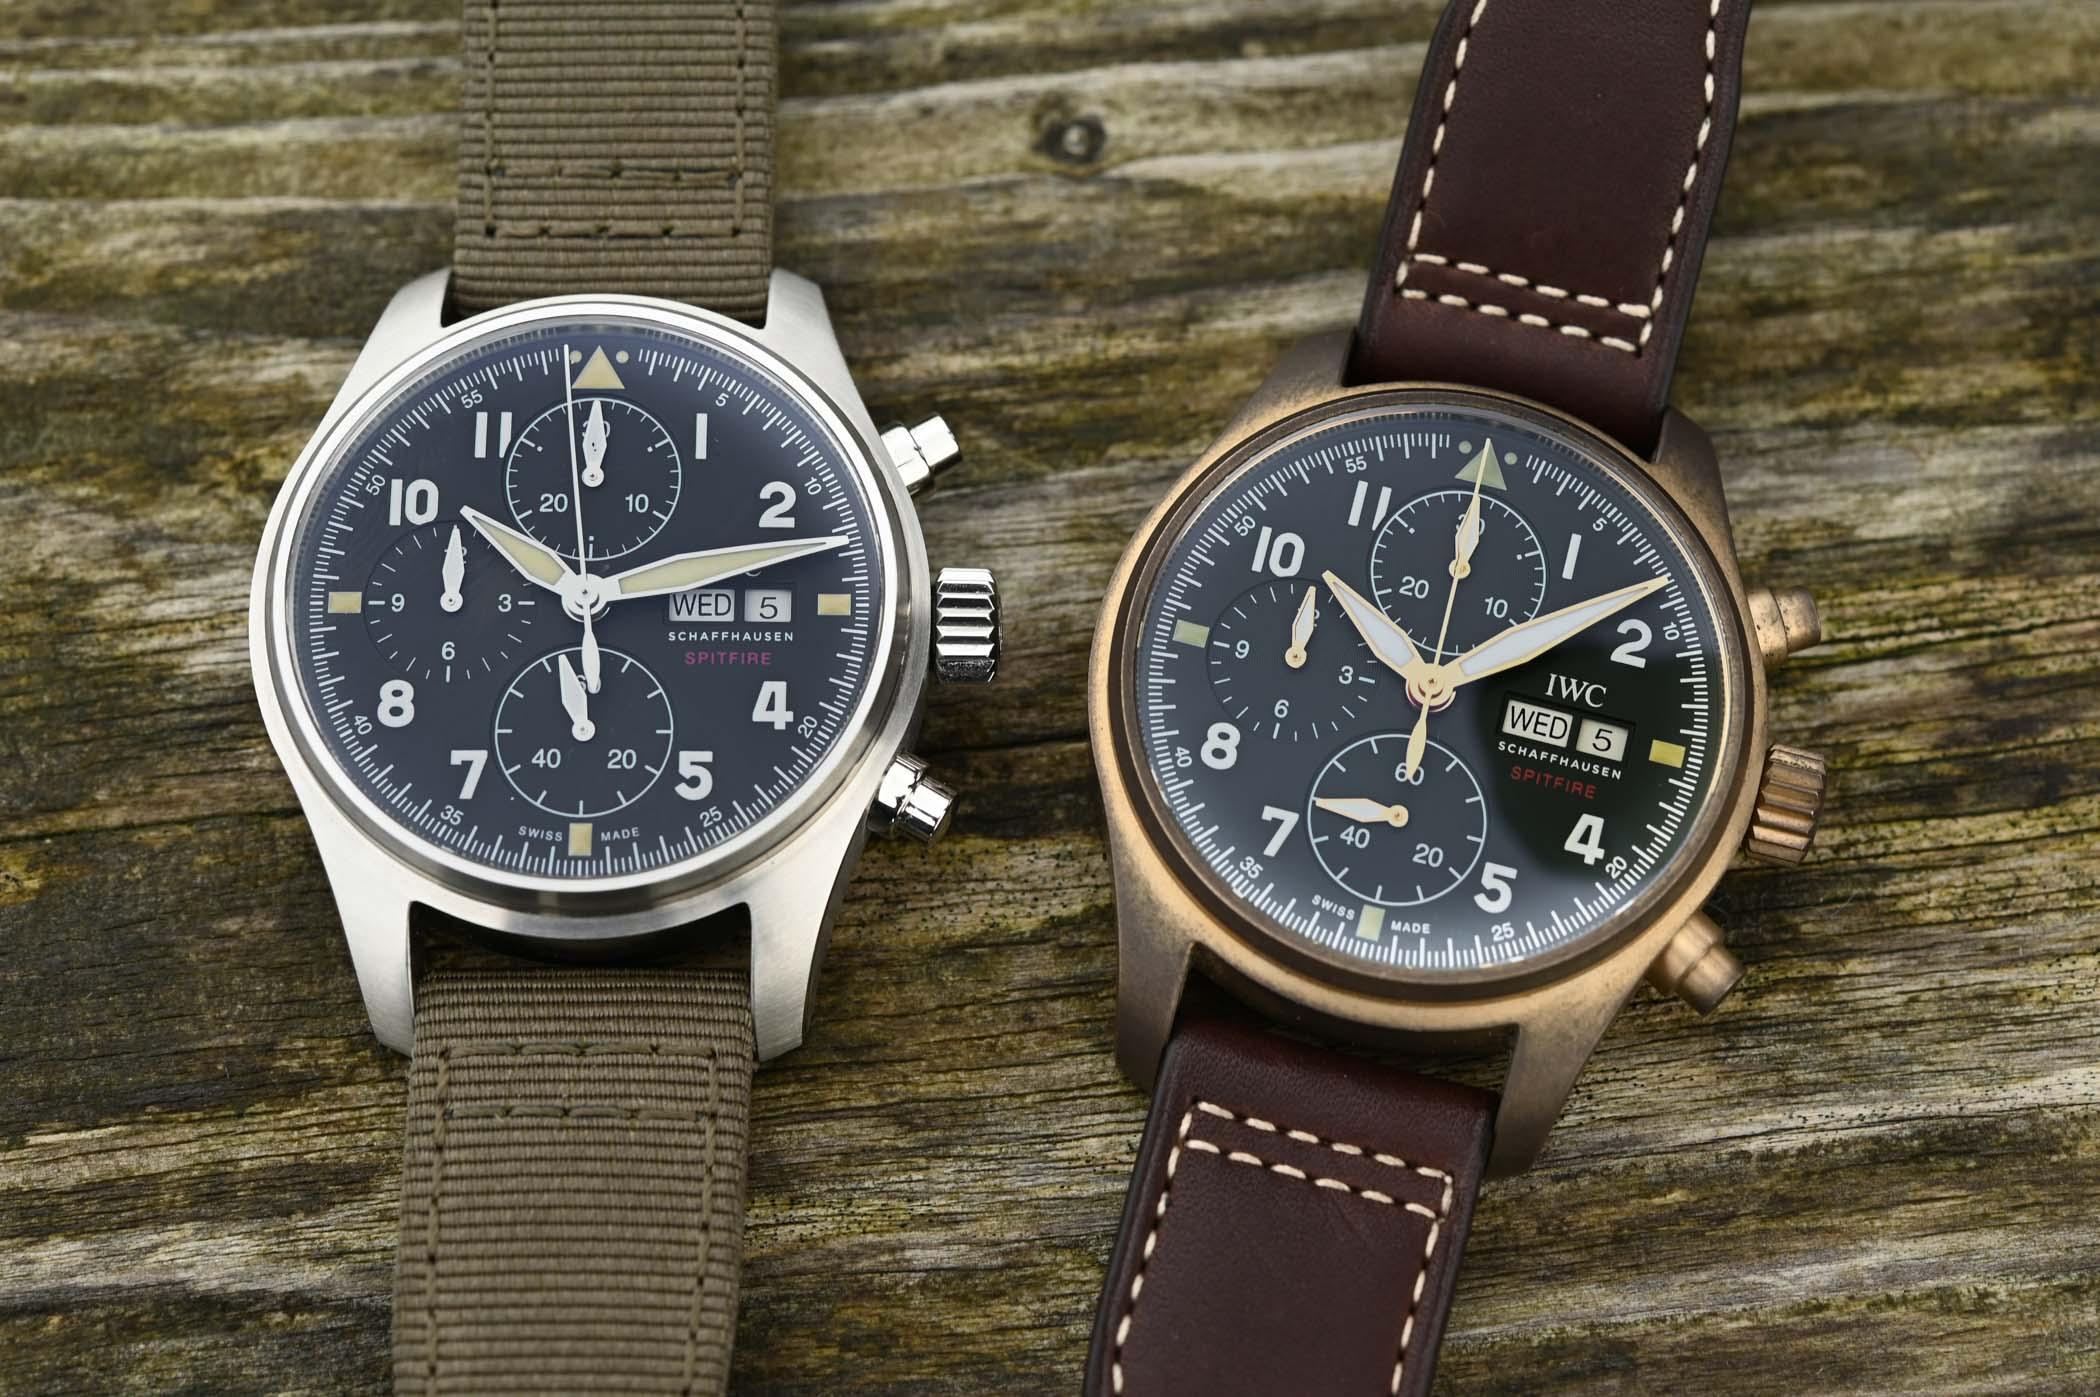 IWC Pilot's Watch Chronograph Spitfire Steel 41mm IW387901 - SIHH 2019 - 4